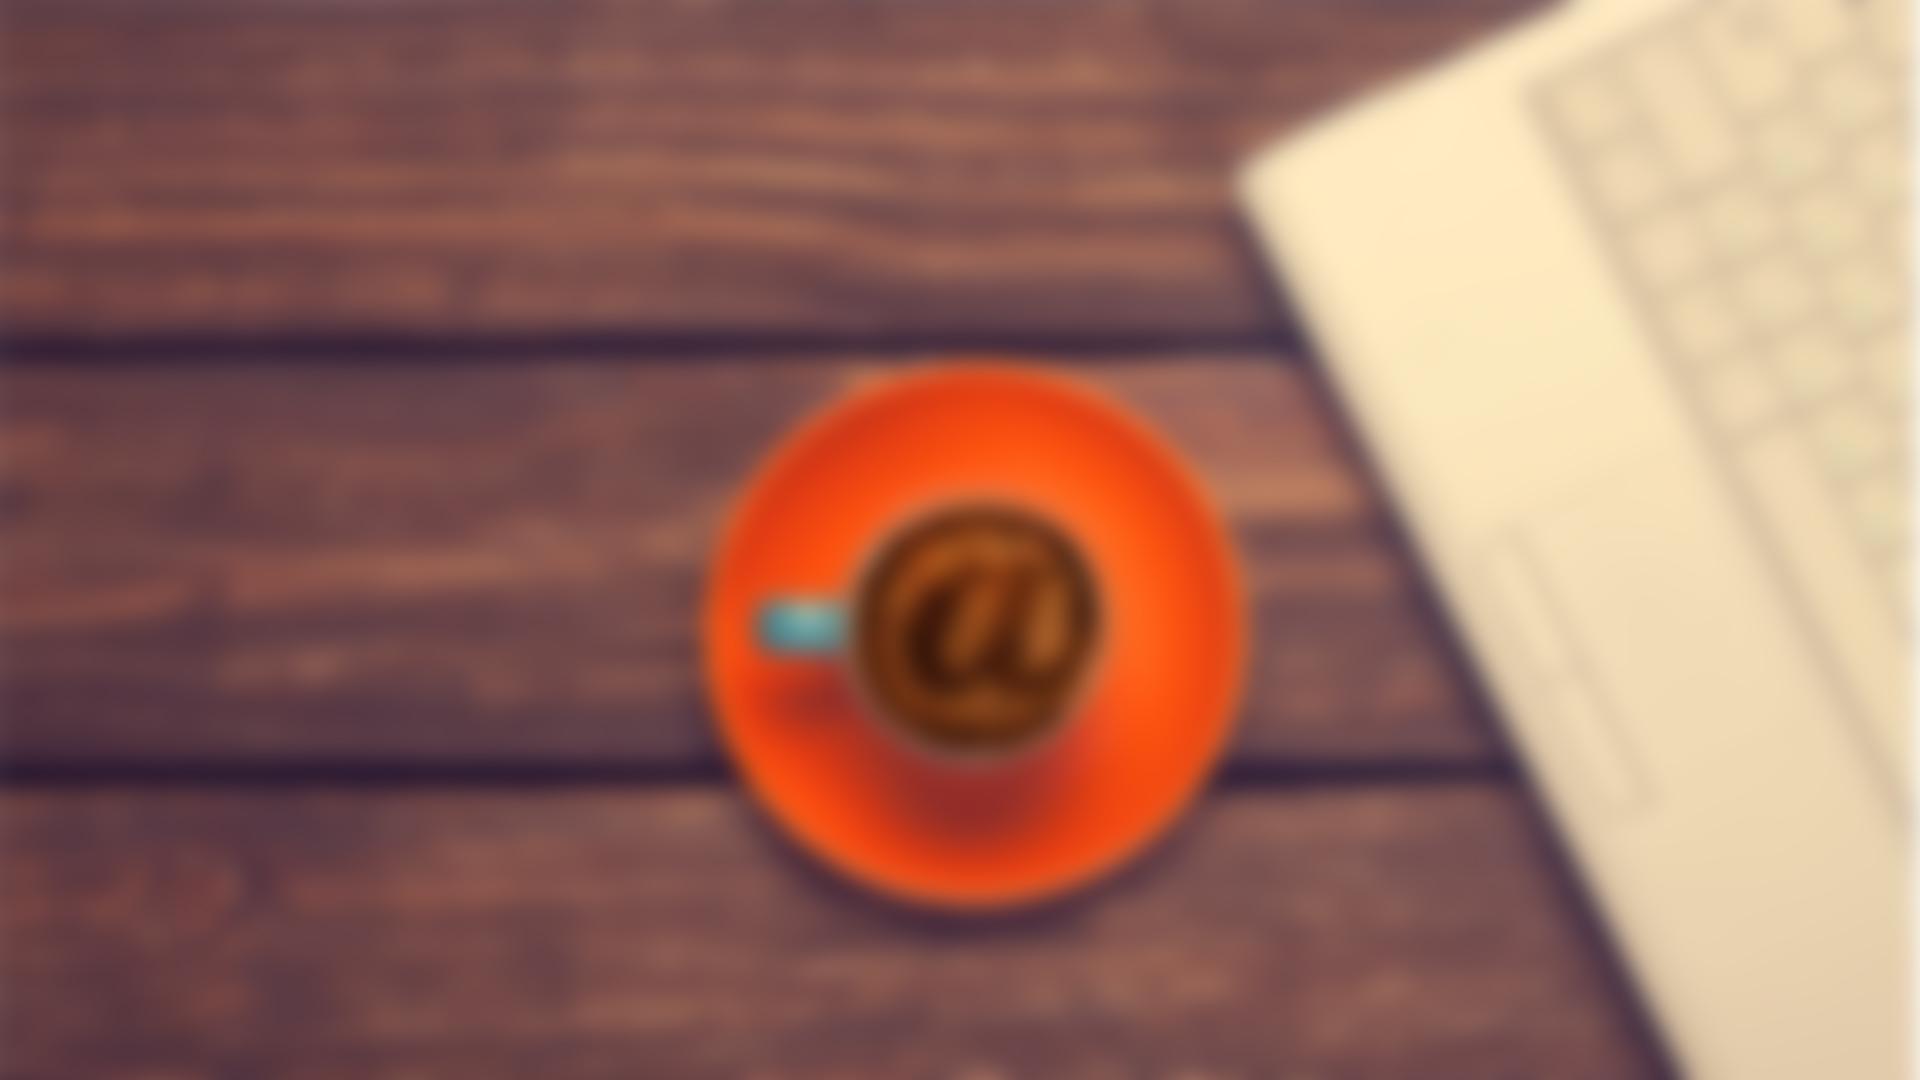 bg-blur